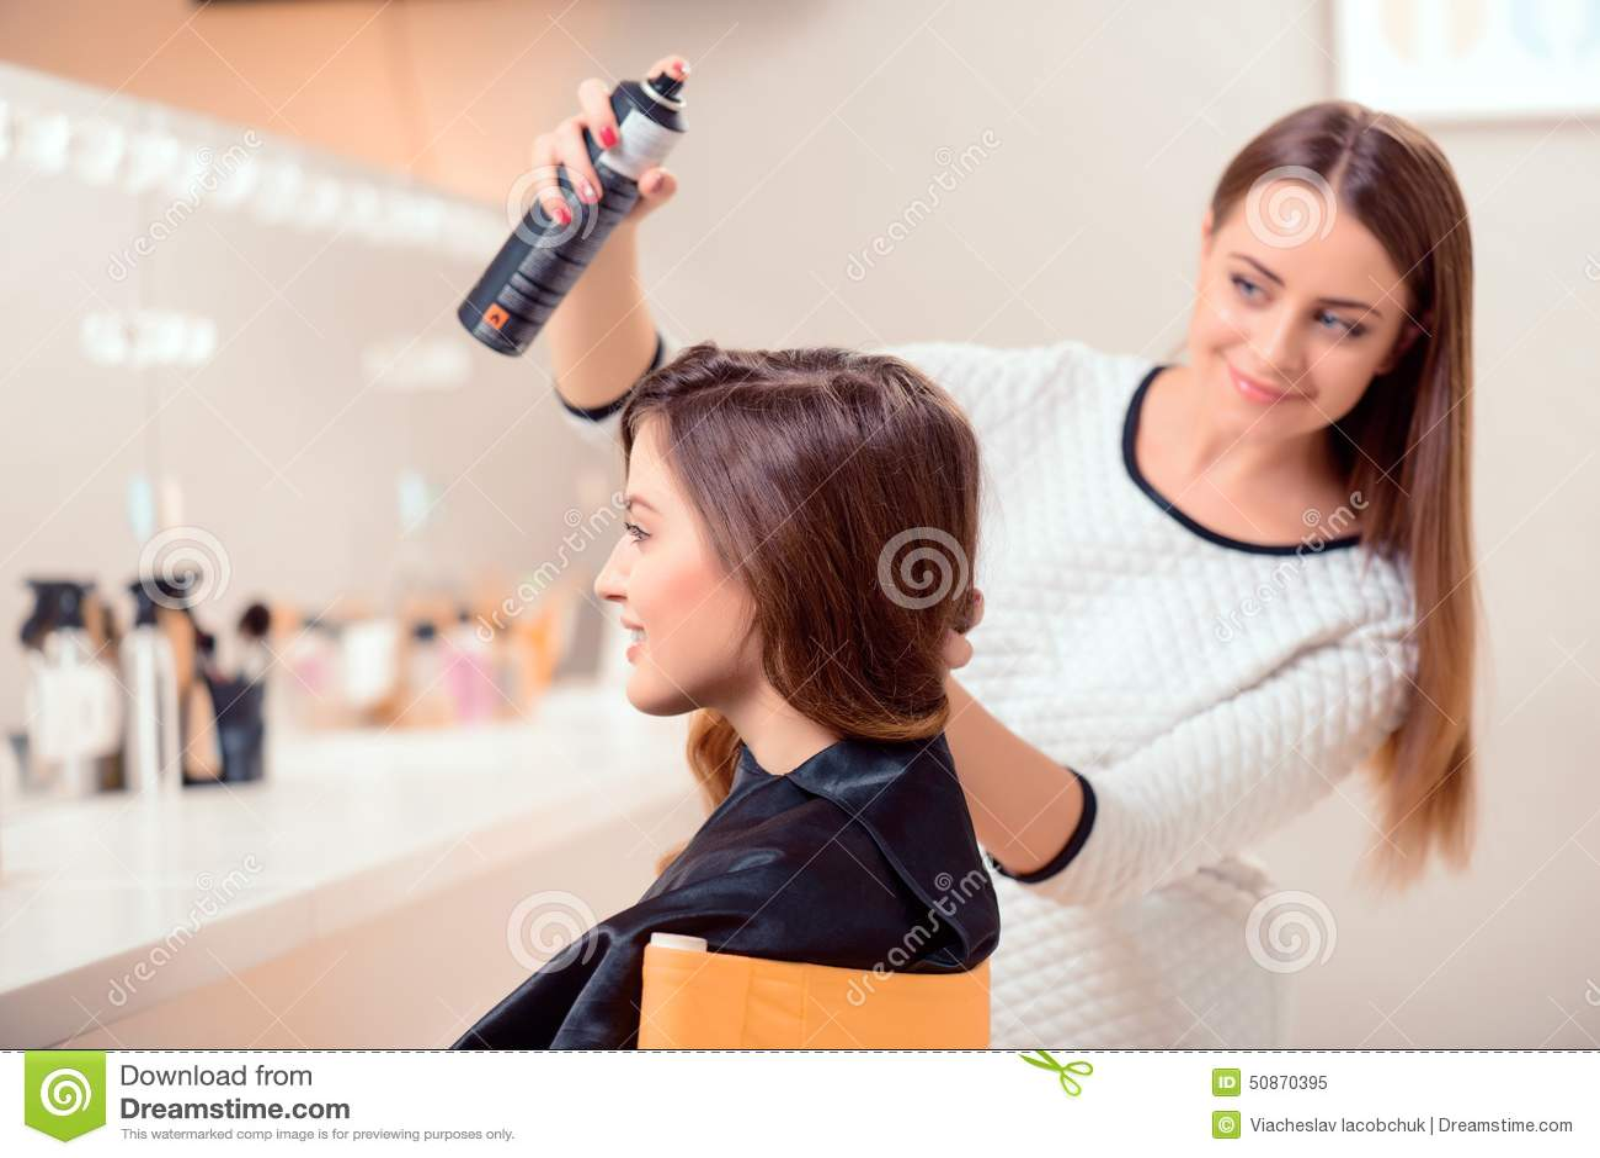 Beautiful woman in hair salon stock image image 50870395 for A beautiful you salon